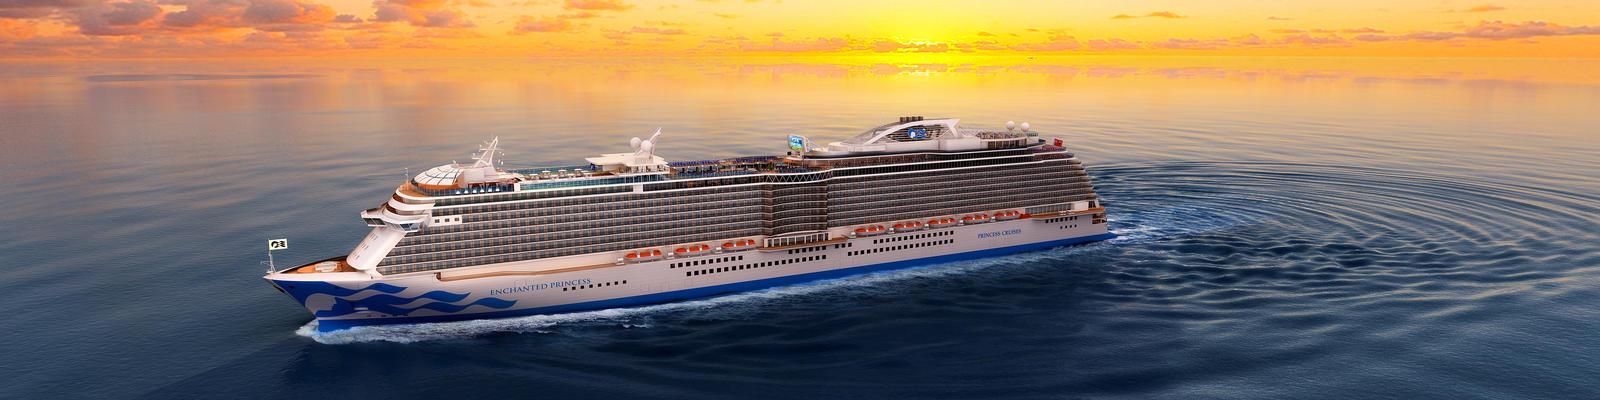 Princess Cruises' Newest Dual-Class Ship, Enchanted Princess, Floats Out